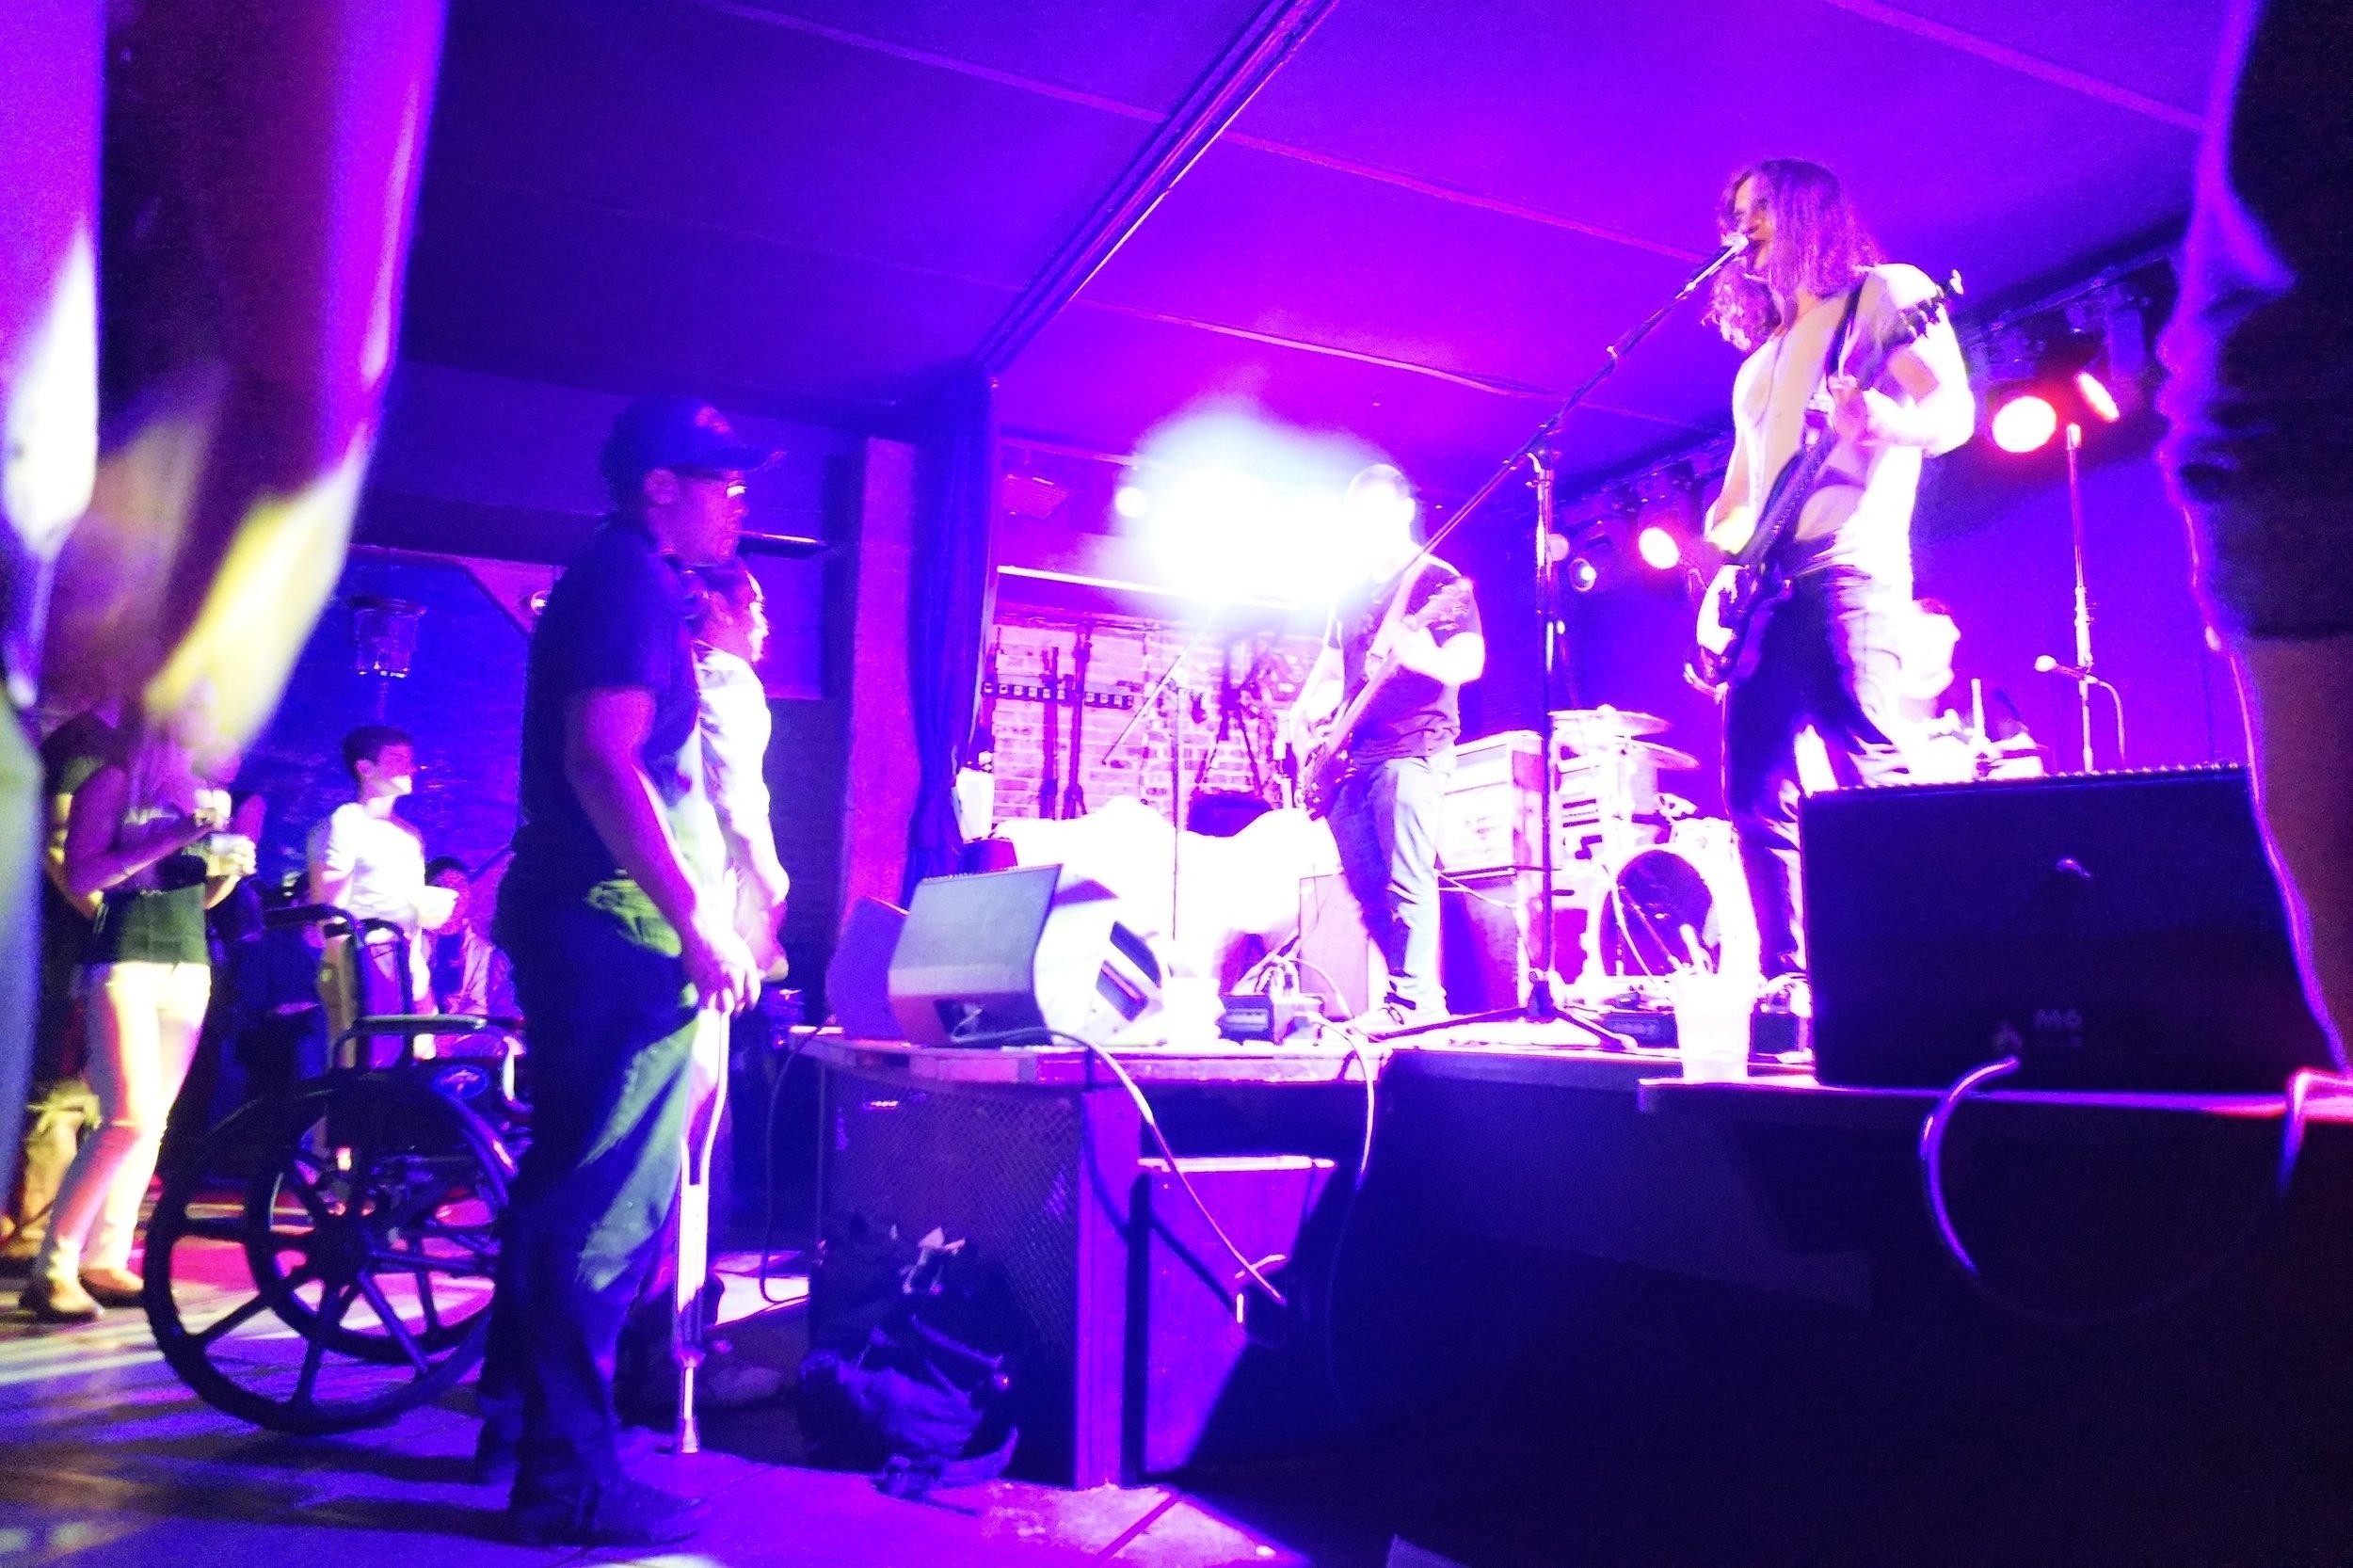 Amazing performance by Newborn at Mercury Lounge